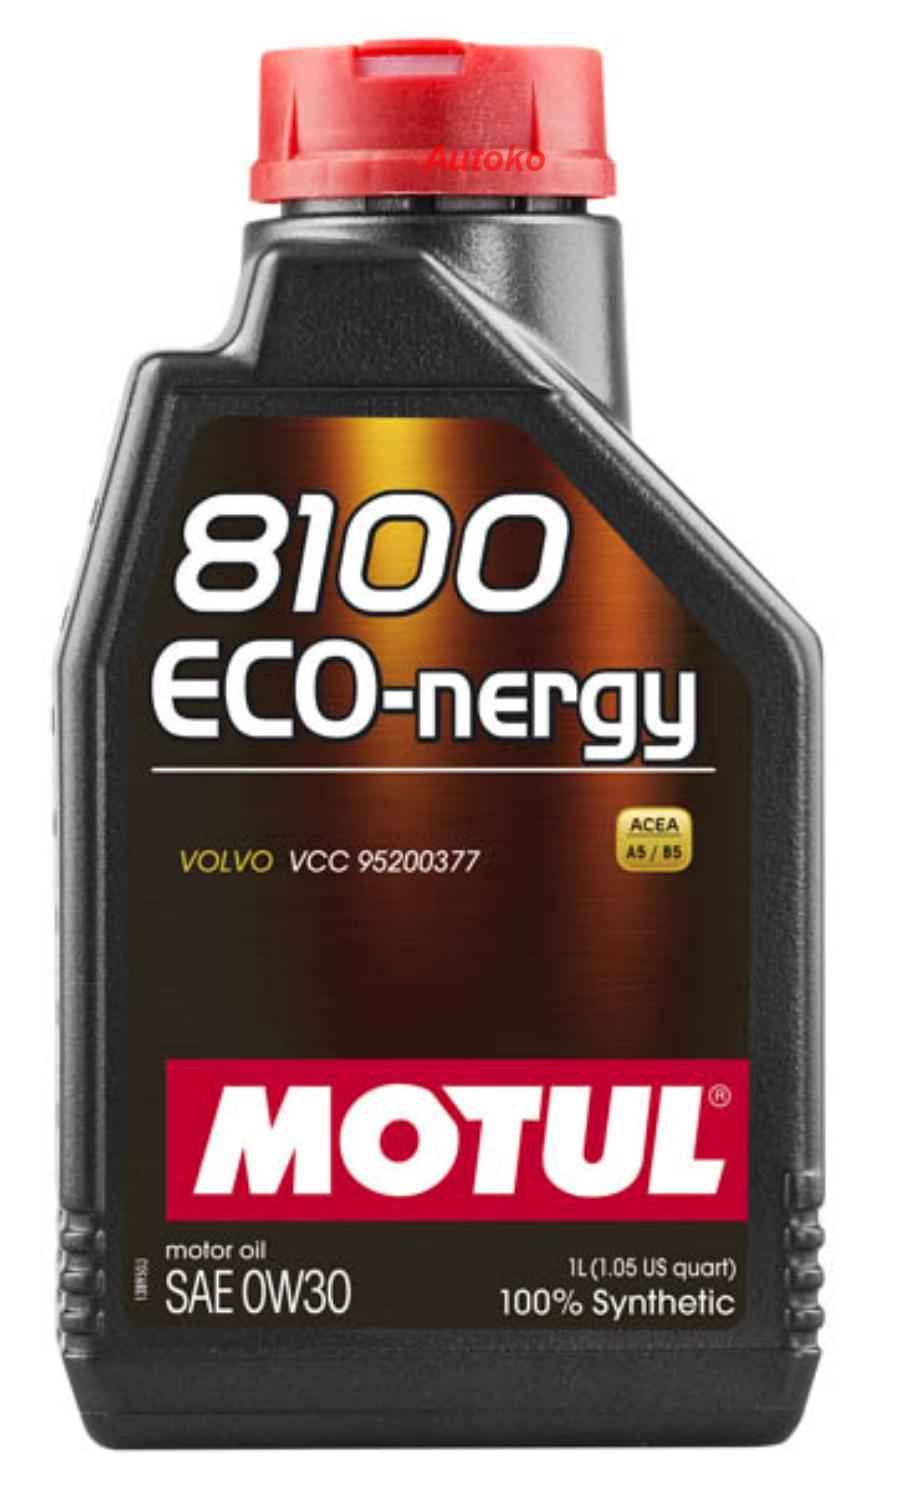 Масло моторное синтетическое 8100 ECO-NERGY 0W-30, 1л